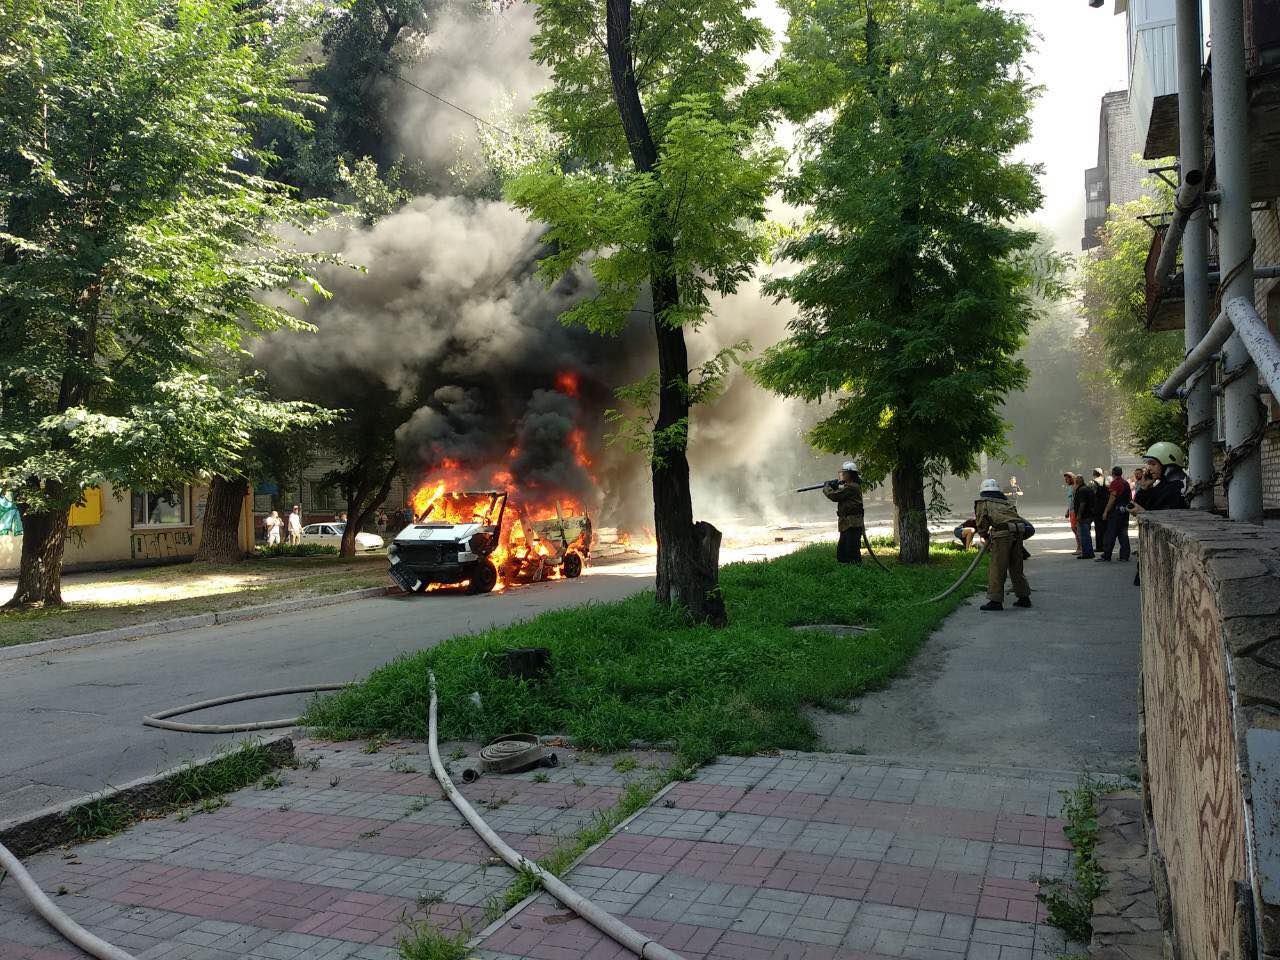 В Днепропетровской области взорвали машину: внутри находился депутат горсовета, - ФОТО, фото-1